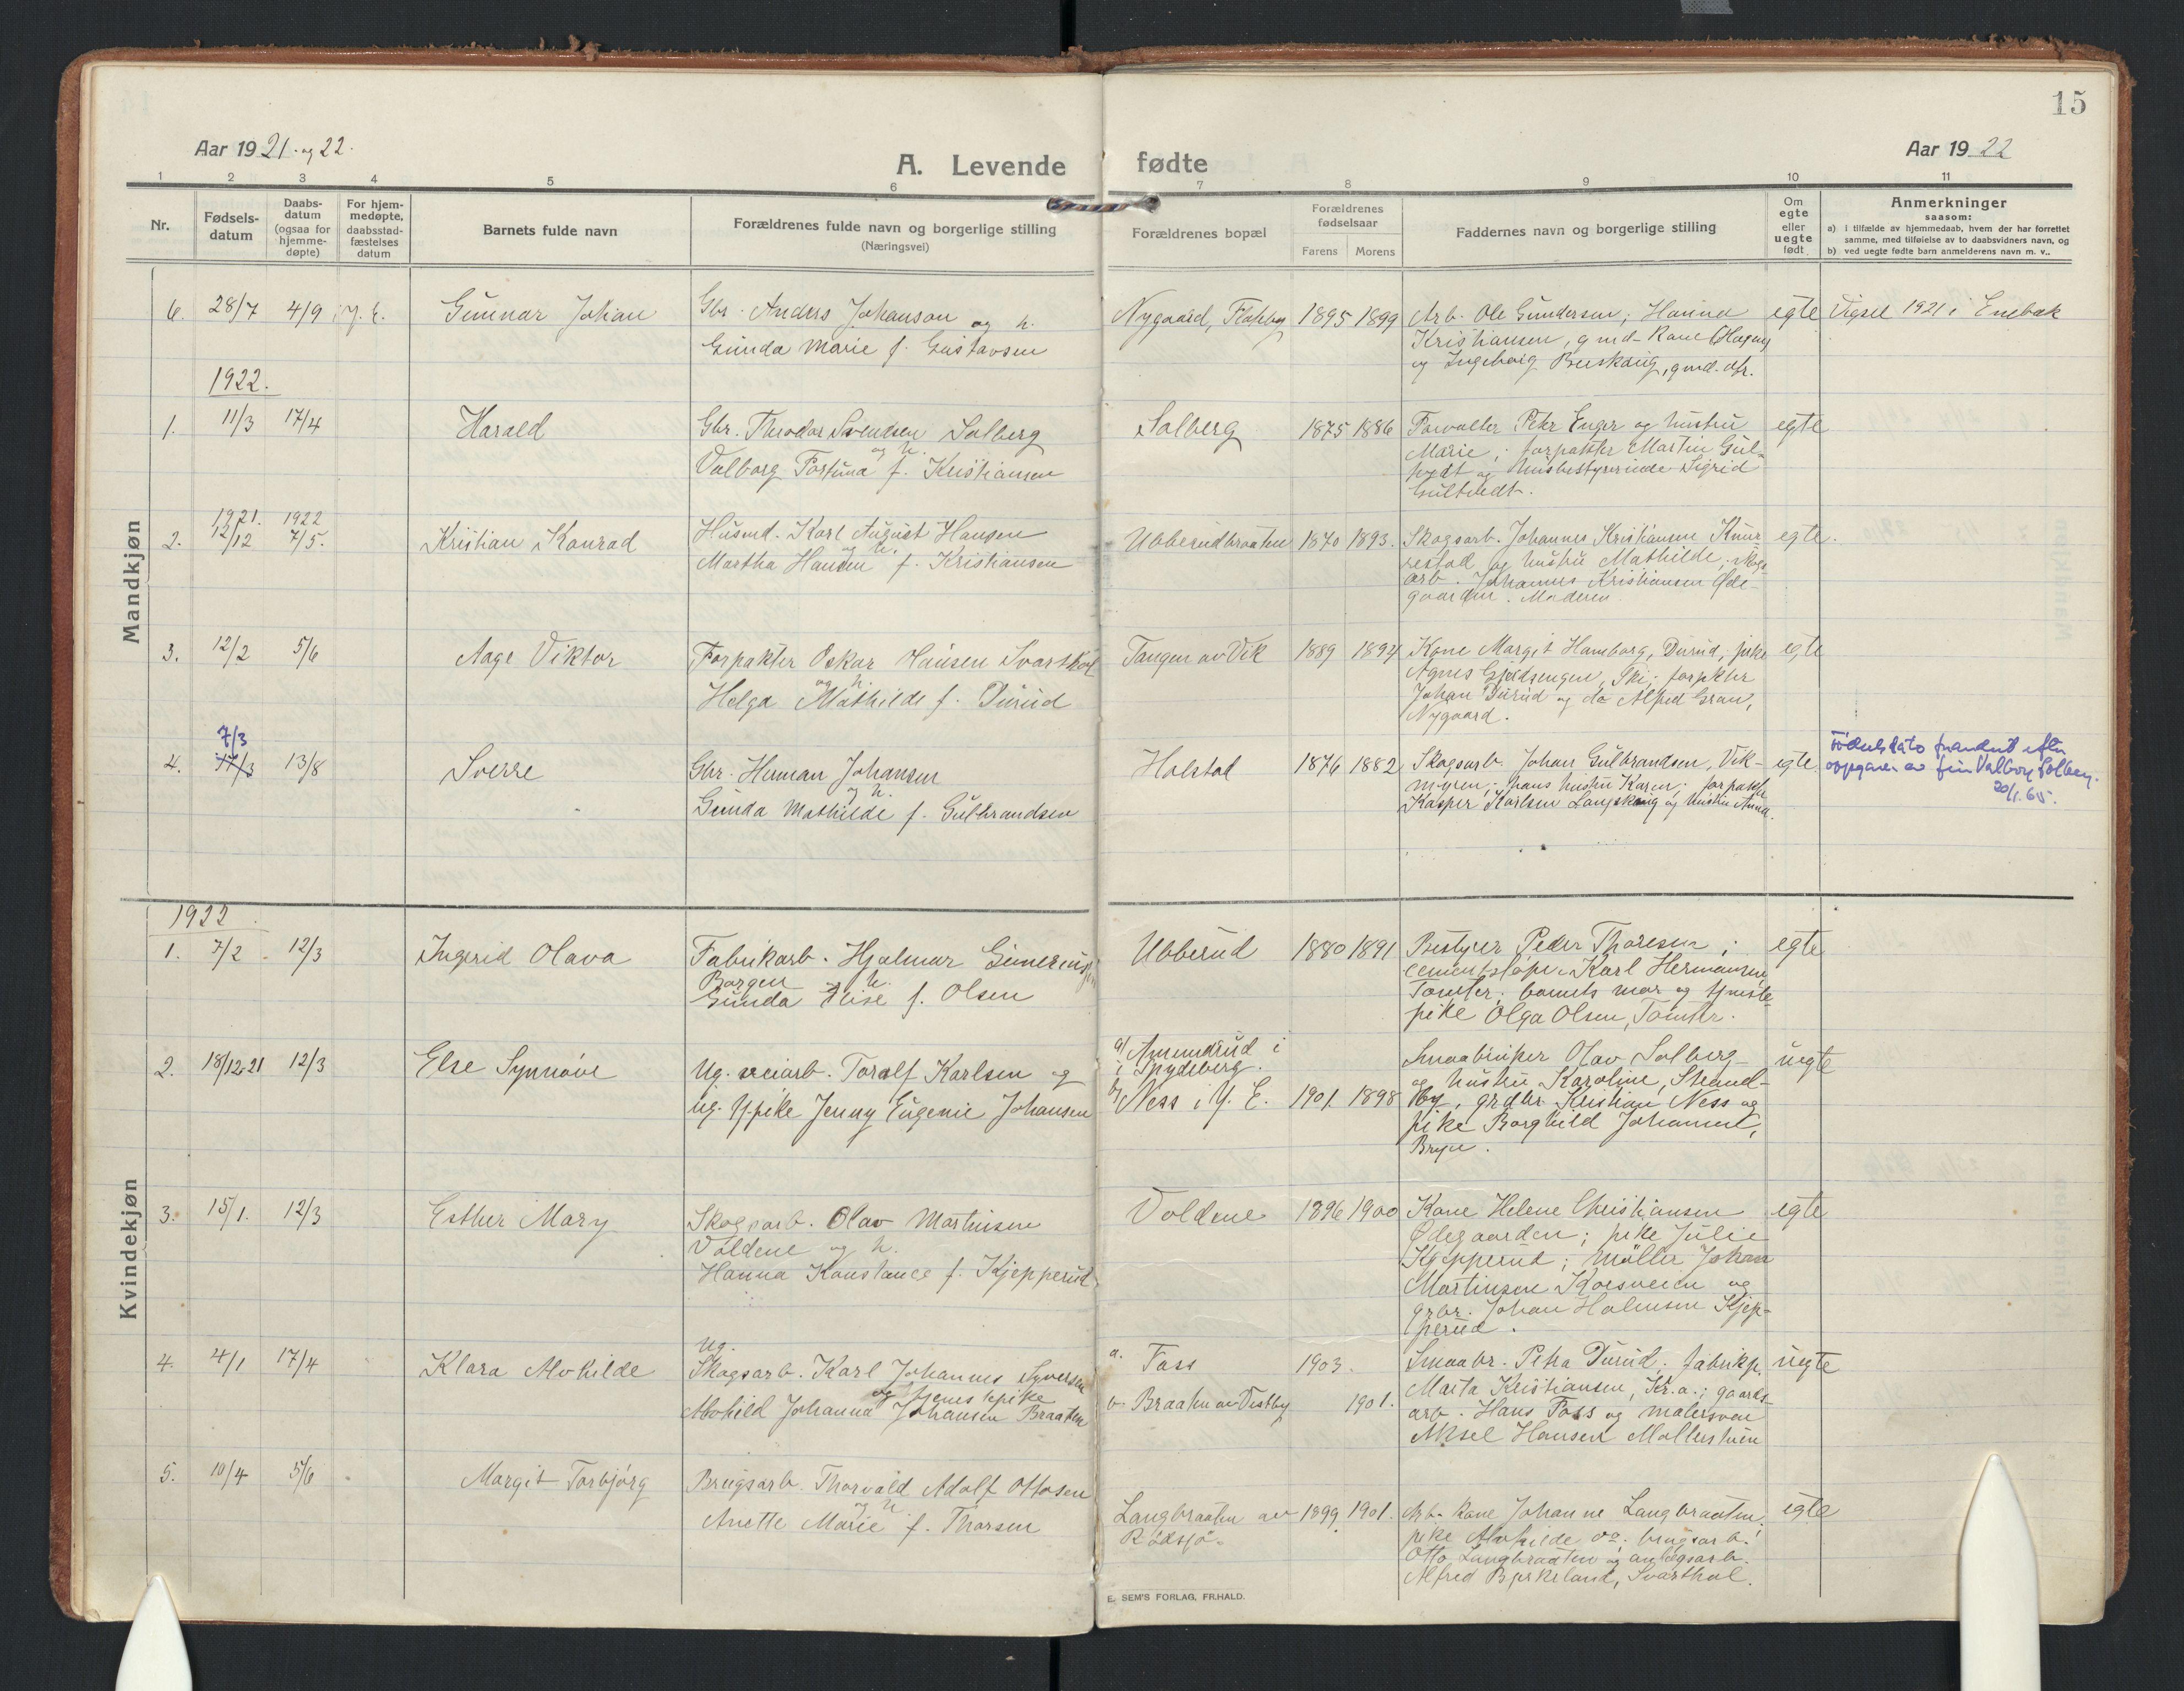 SAO, Enebakk prestekontor Kirkebøker, F/Fb/L0003: Parish register (official) no. II 3, 1912-1946, p. 15